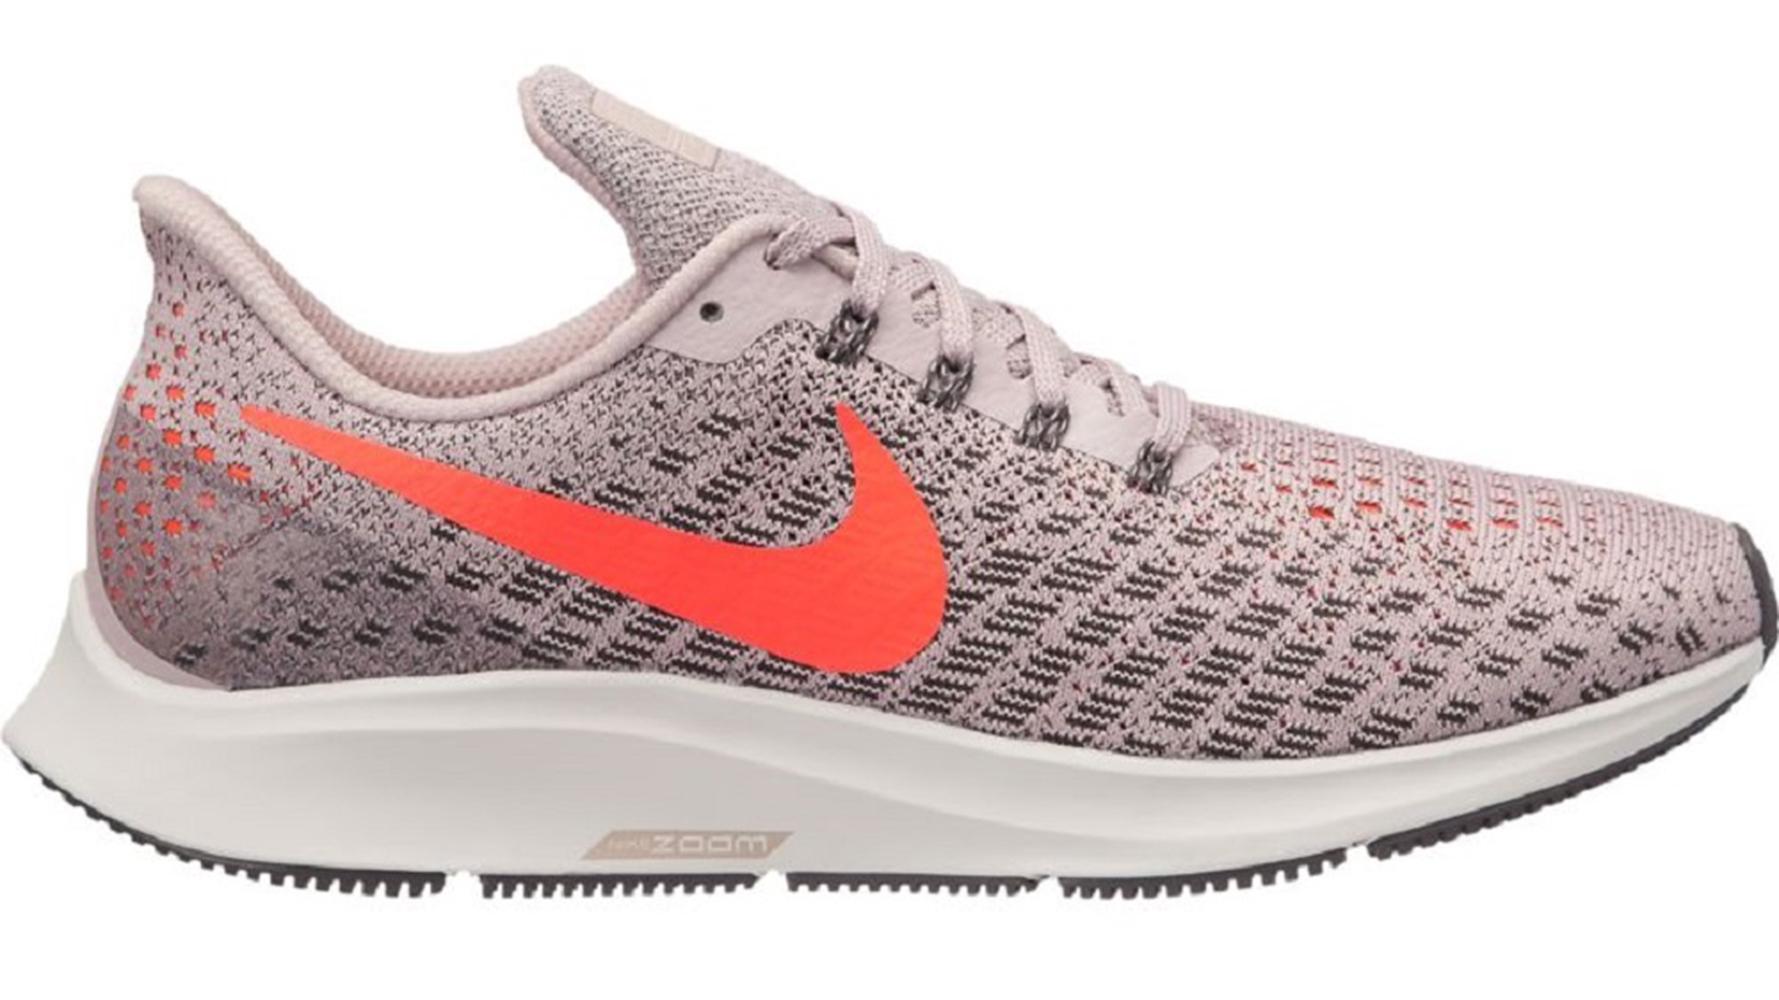 finest selection e8af2 0218d Shoes Woman Air Zoom Pegasus 35 colore Grey Red - Nike - SportIT.com